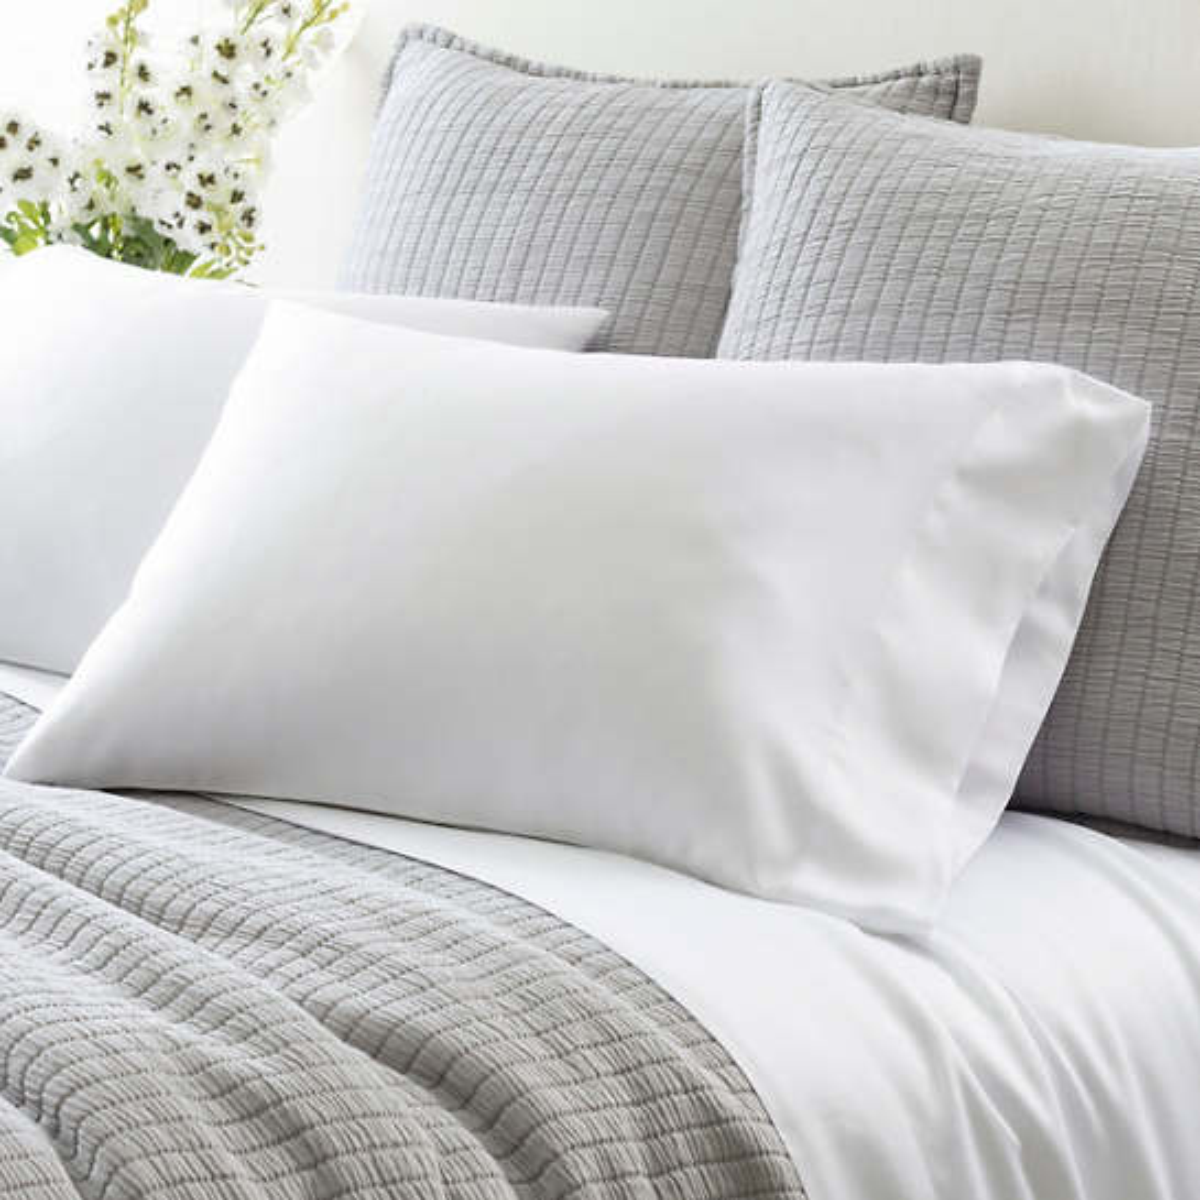 Silken Solid Pillowcases (Pair)